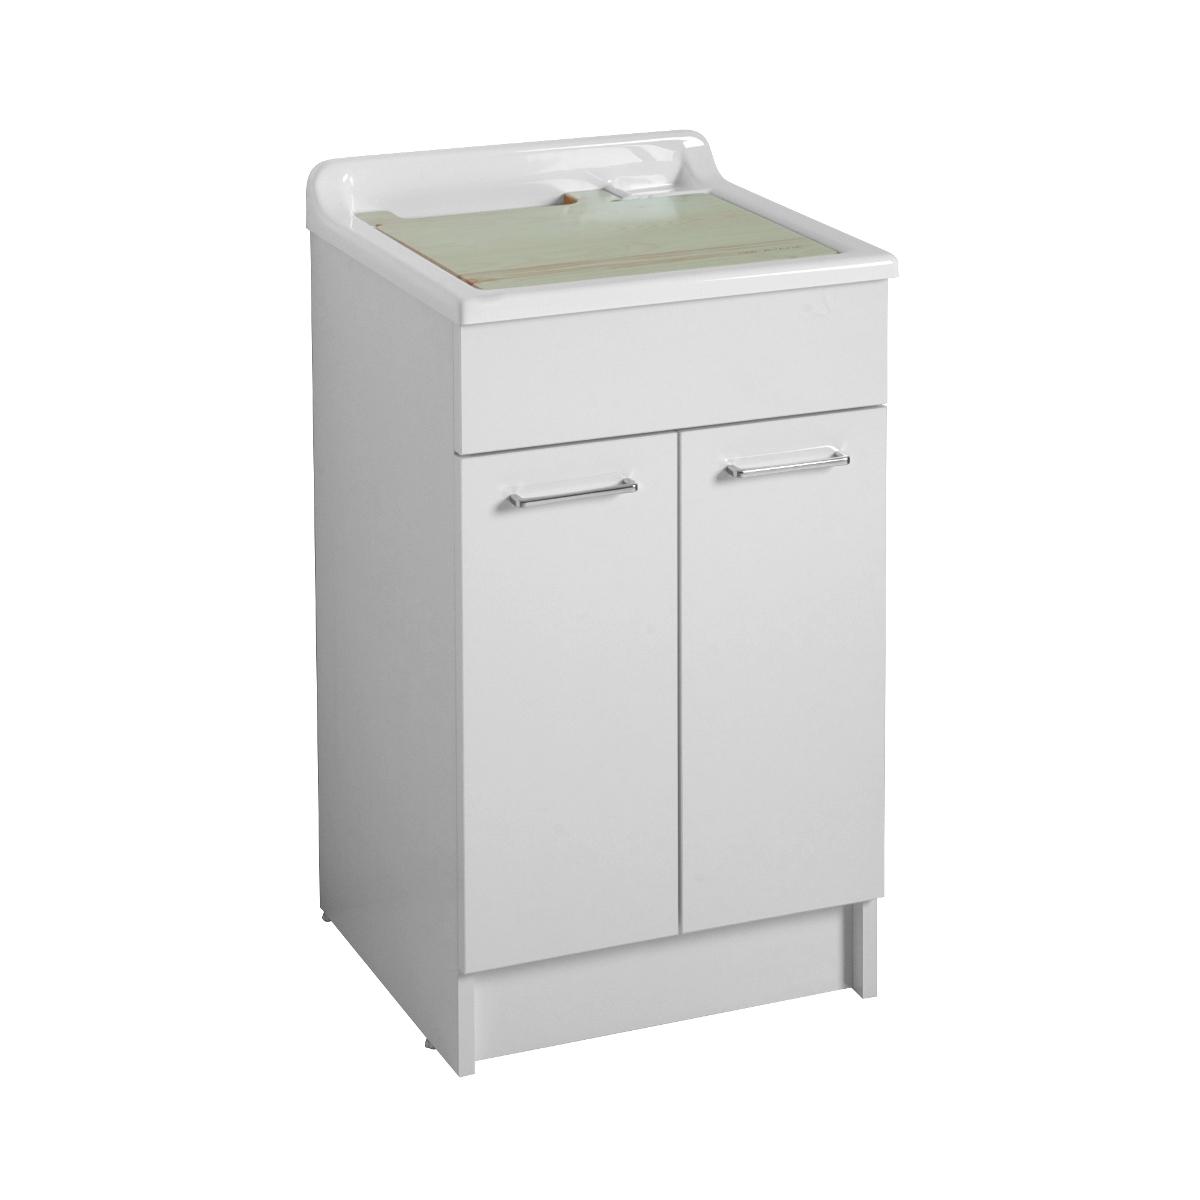 https://www.bagnoshop.com/public/mobile-con-lavatoio-lavanderia-50x50x84h.jpg